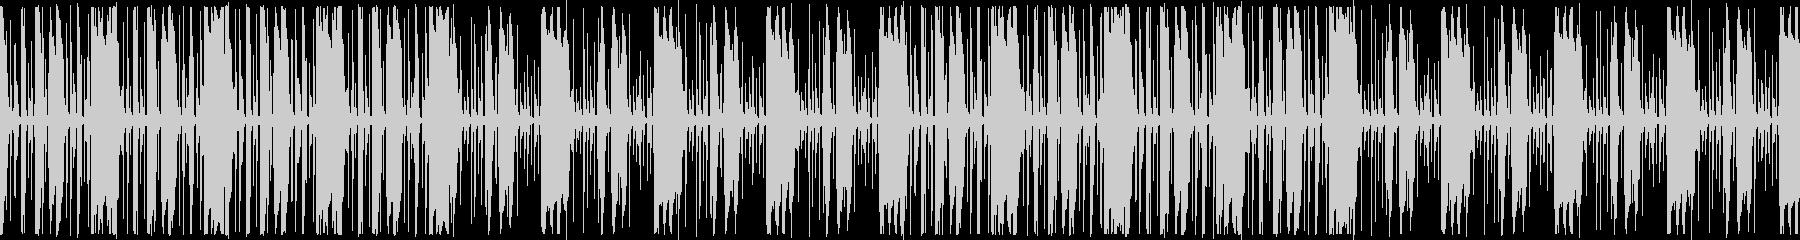 CFB-002 Loopの未再生の波形